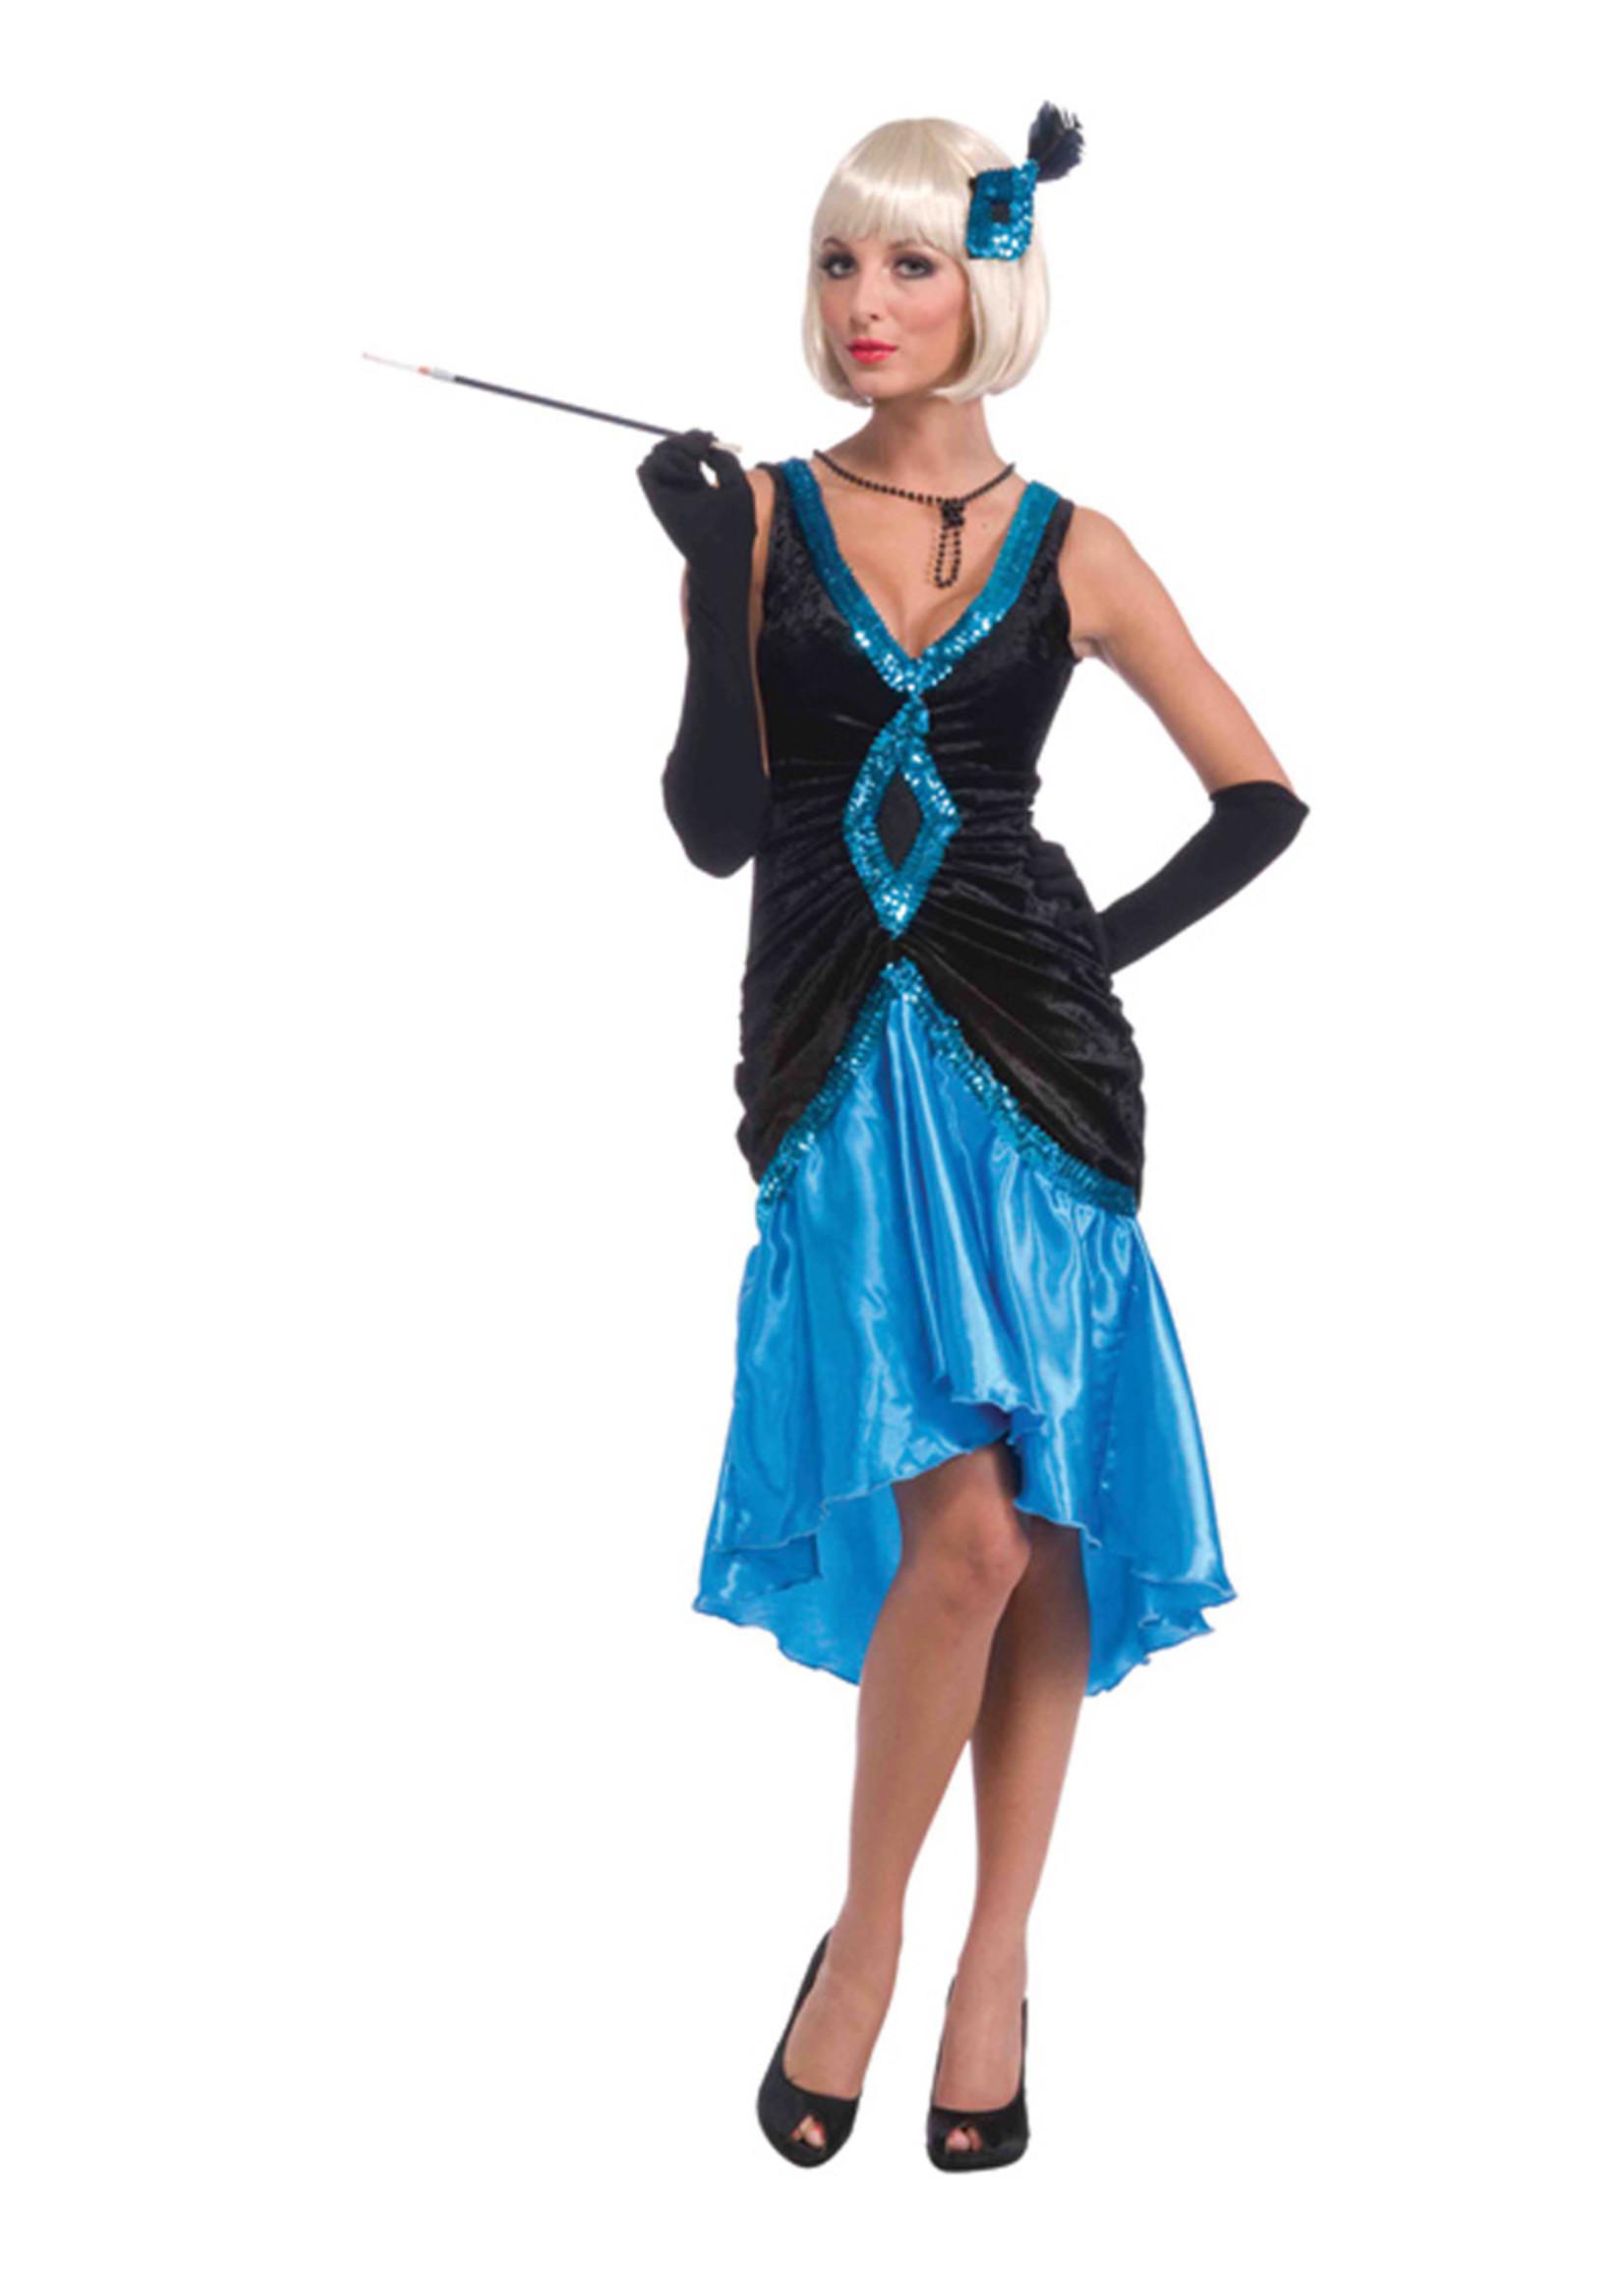 Betty Blue Flapper Costume - Women's